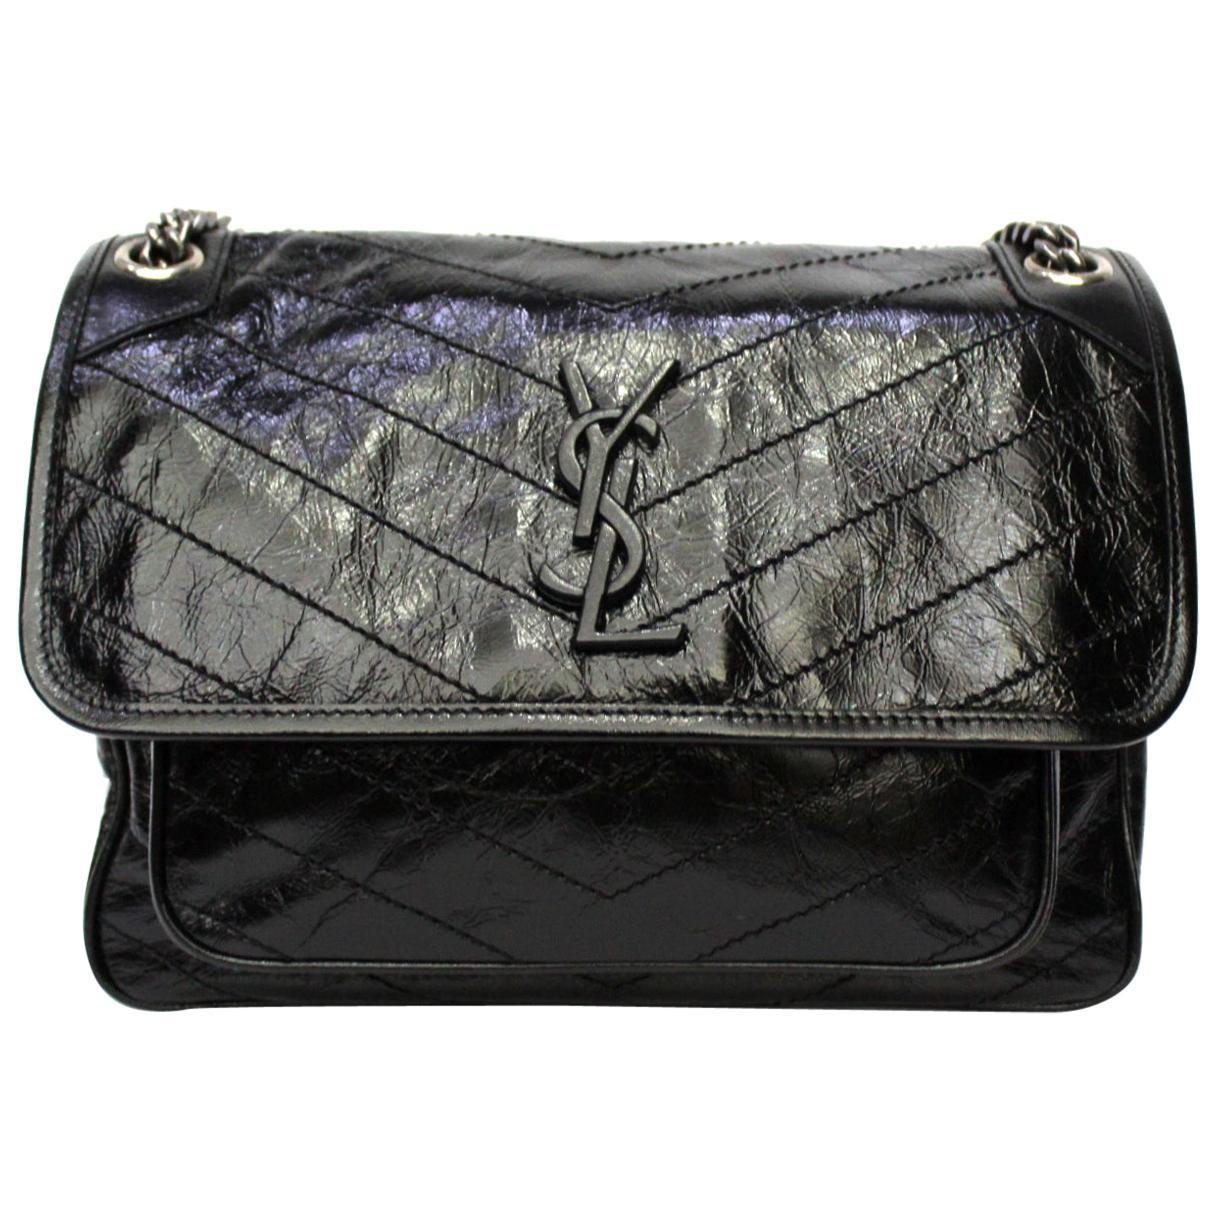 Saint Laurent Black Leather Niki Bag